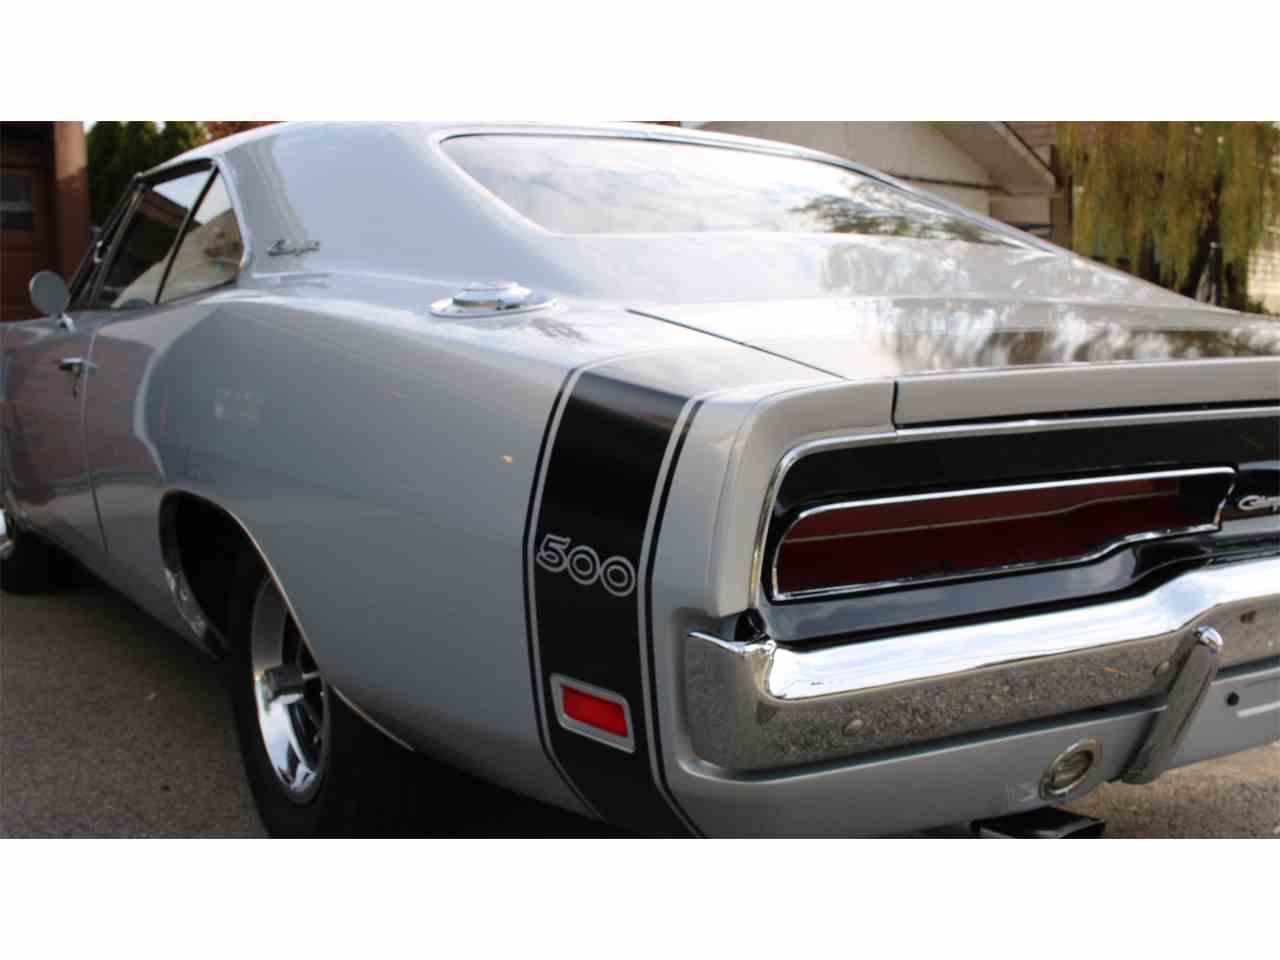 Used Suv Under 5000 Edmonton: 1969 Dodge Charger 500 For Sale